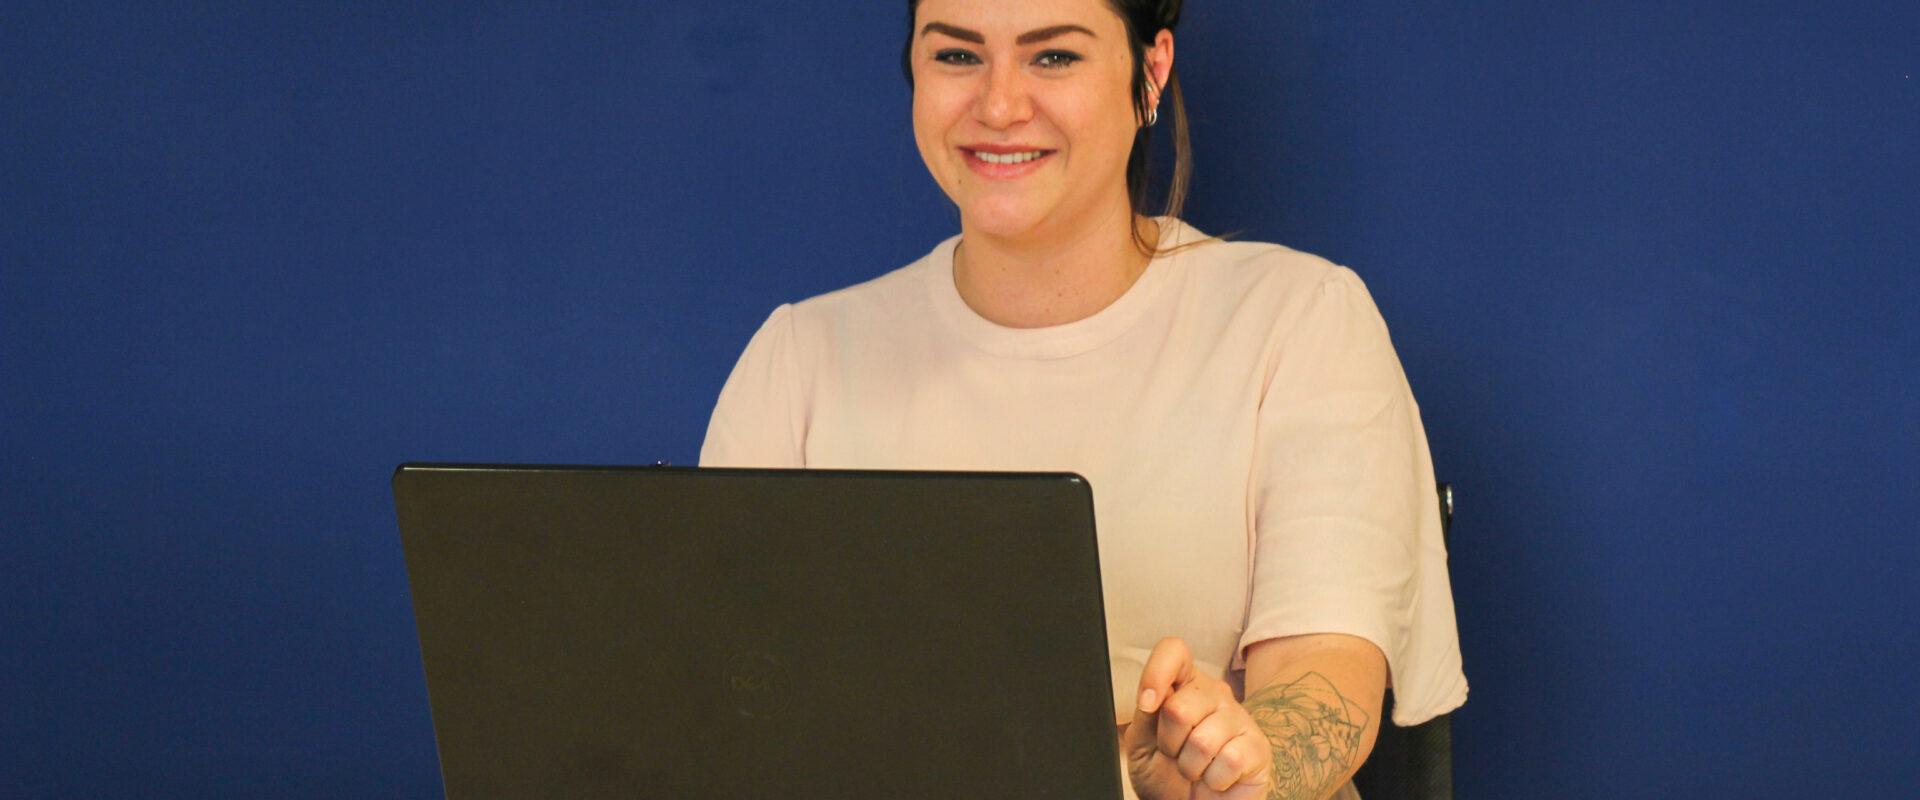 Linda achter laptop